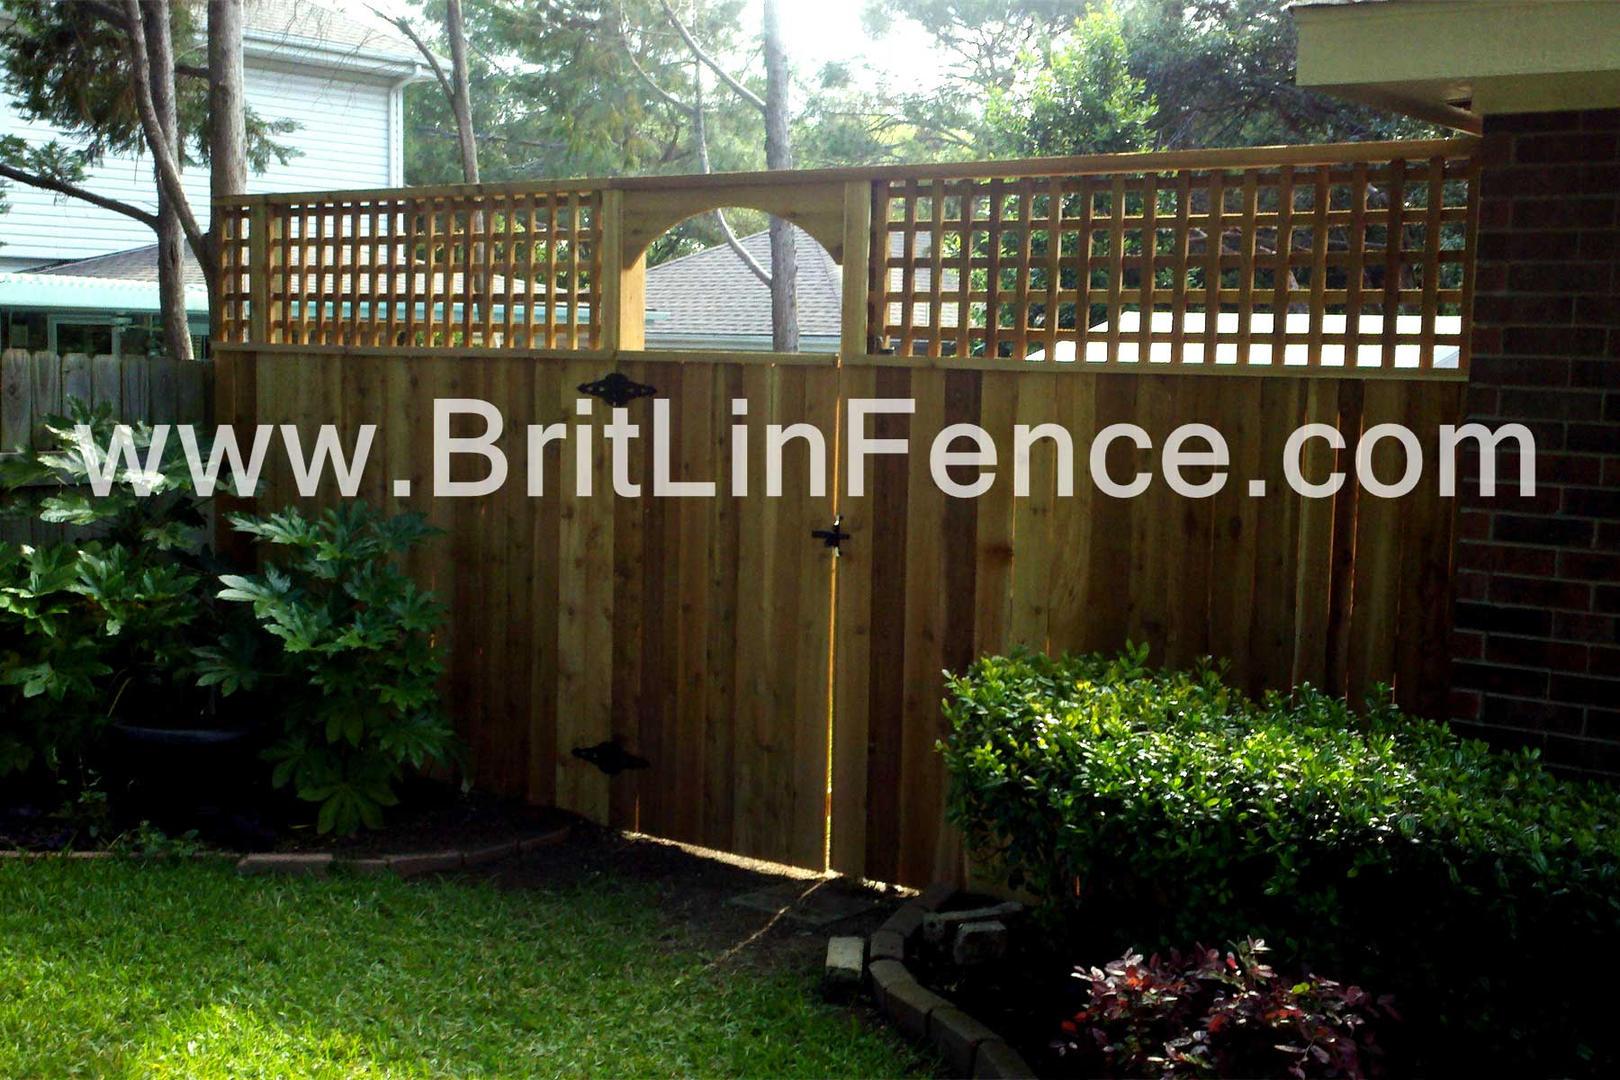 BritLin Fence image 1